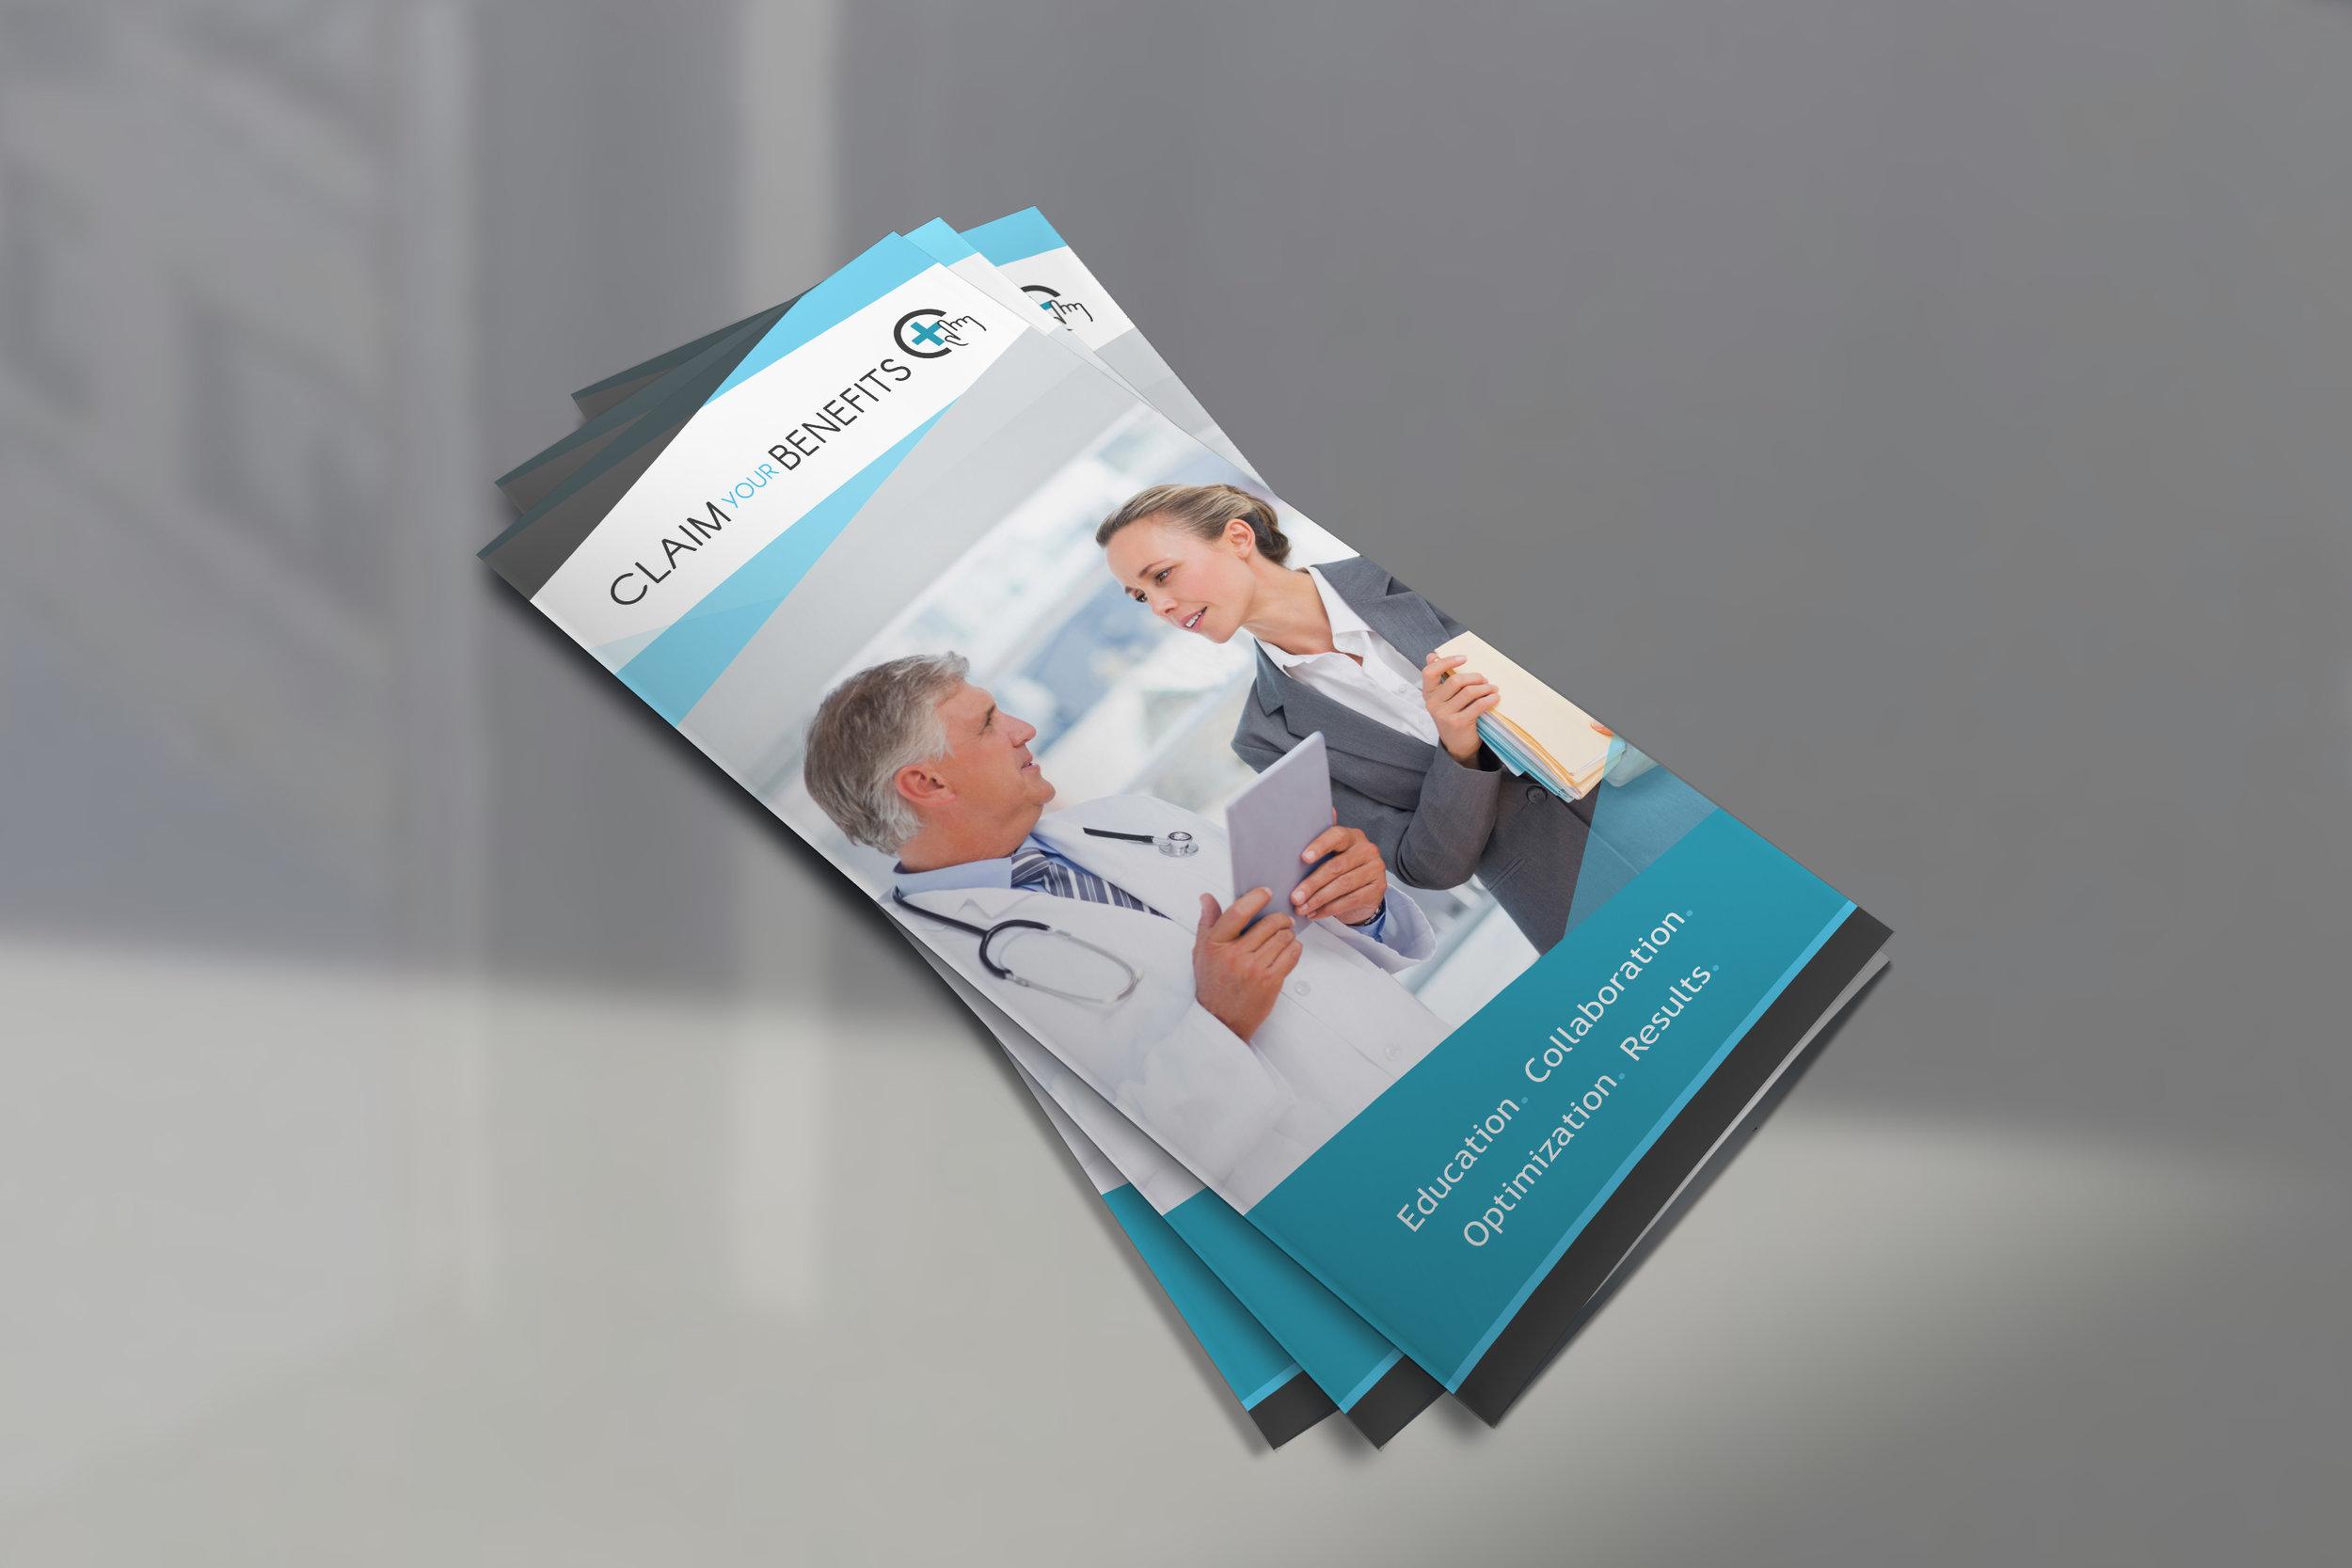 Trifold Brochure Mock-Up - cover copy.jpg